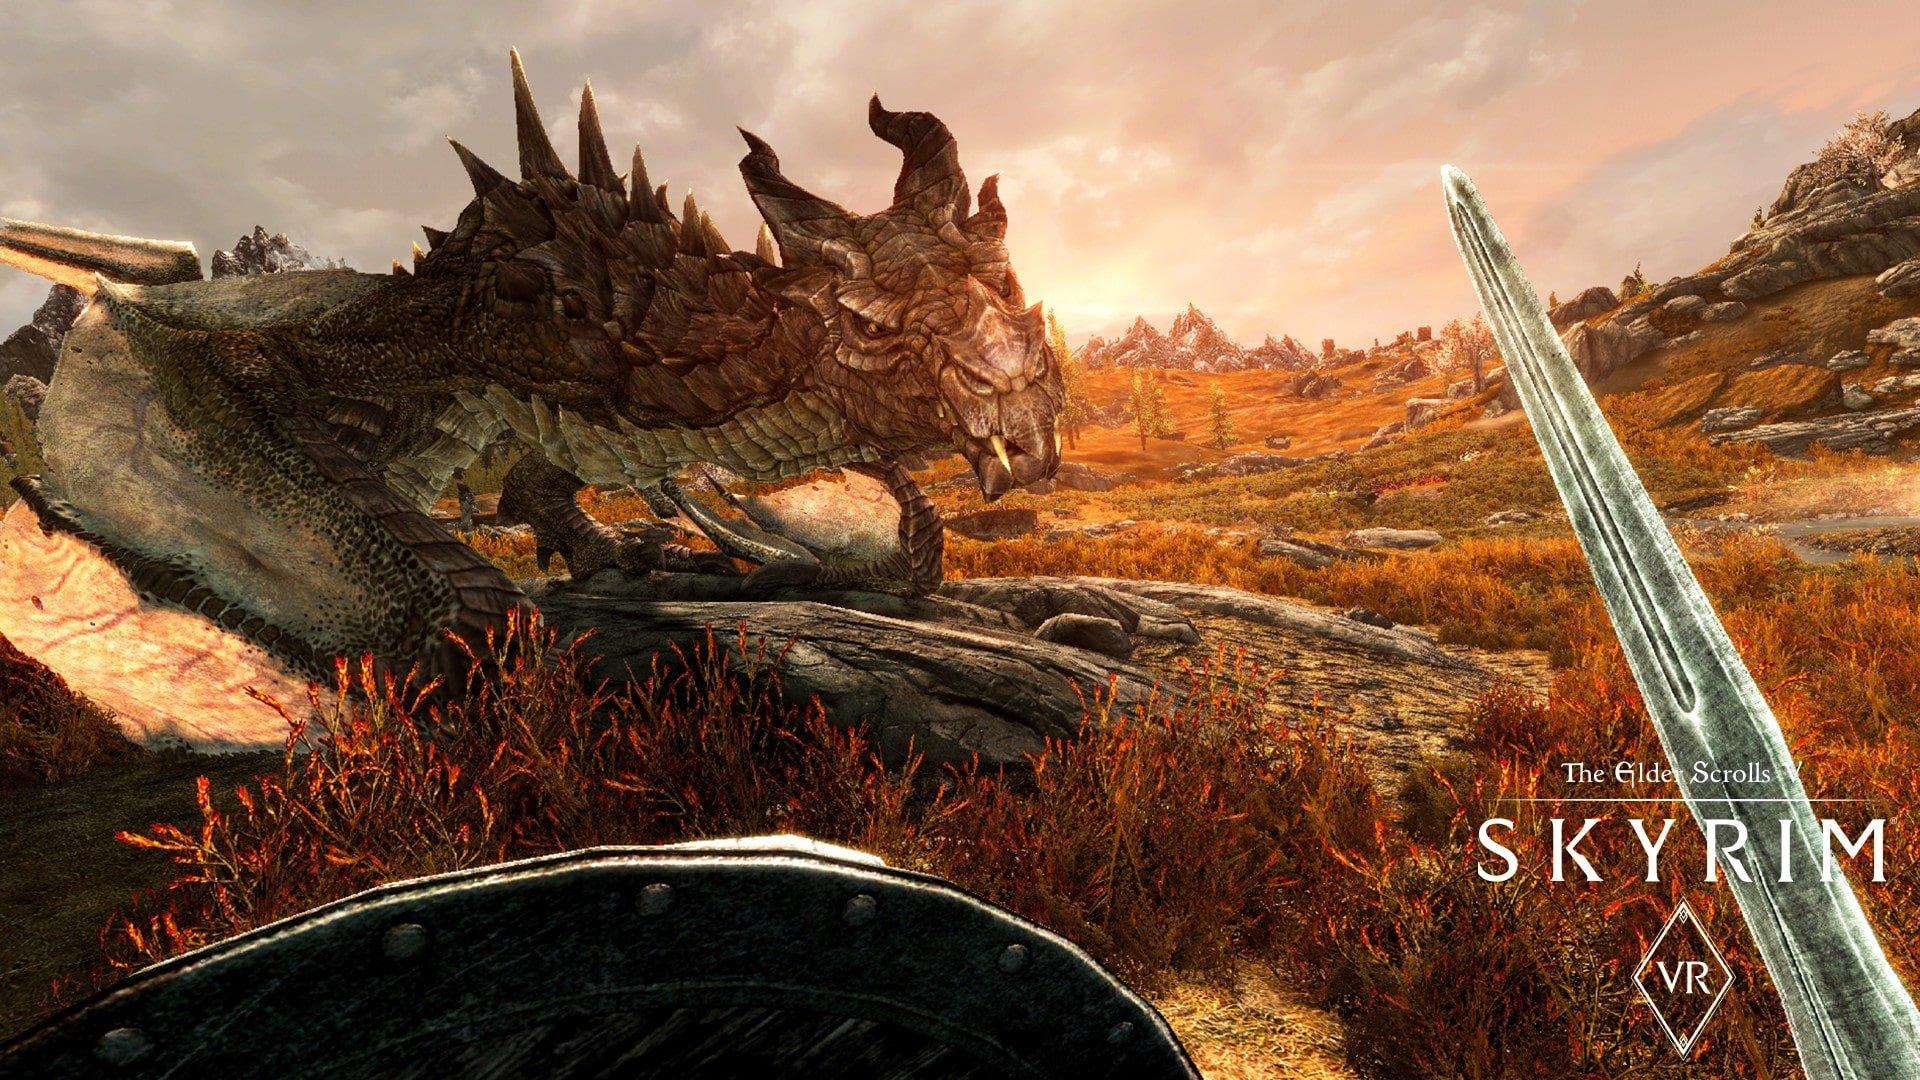 Facing down a dragon in Skyrim VR